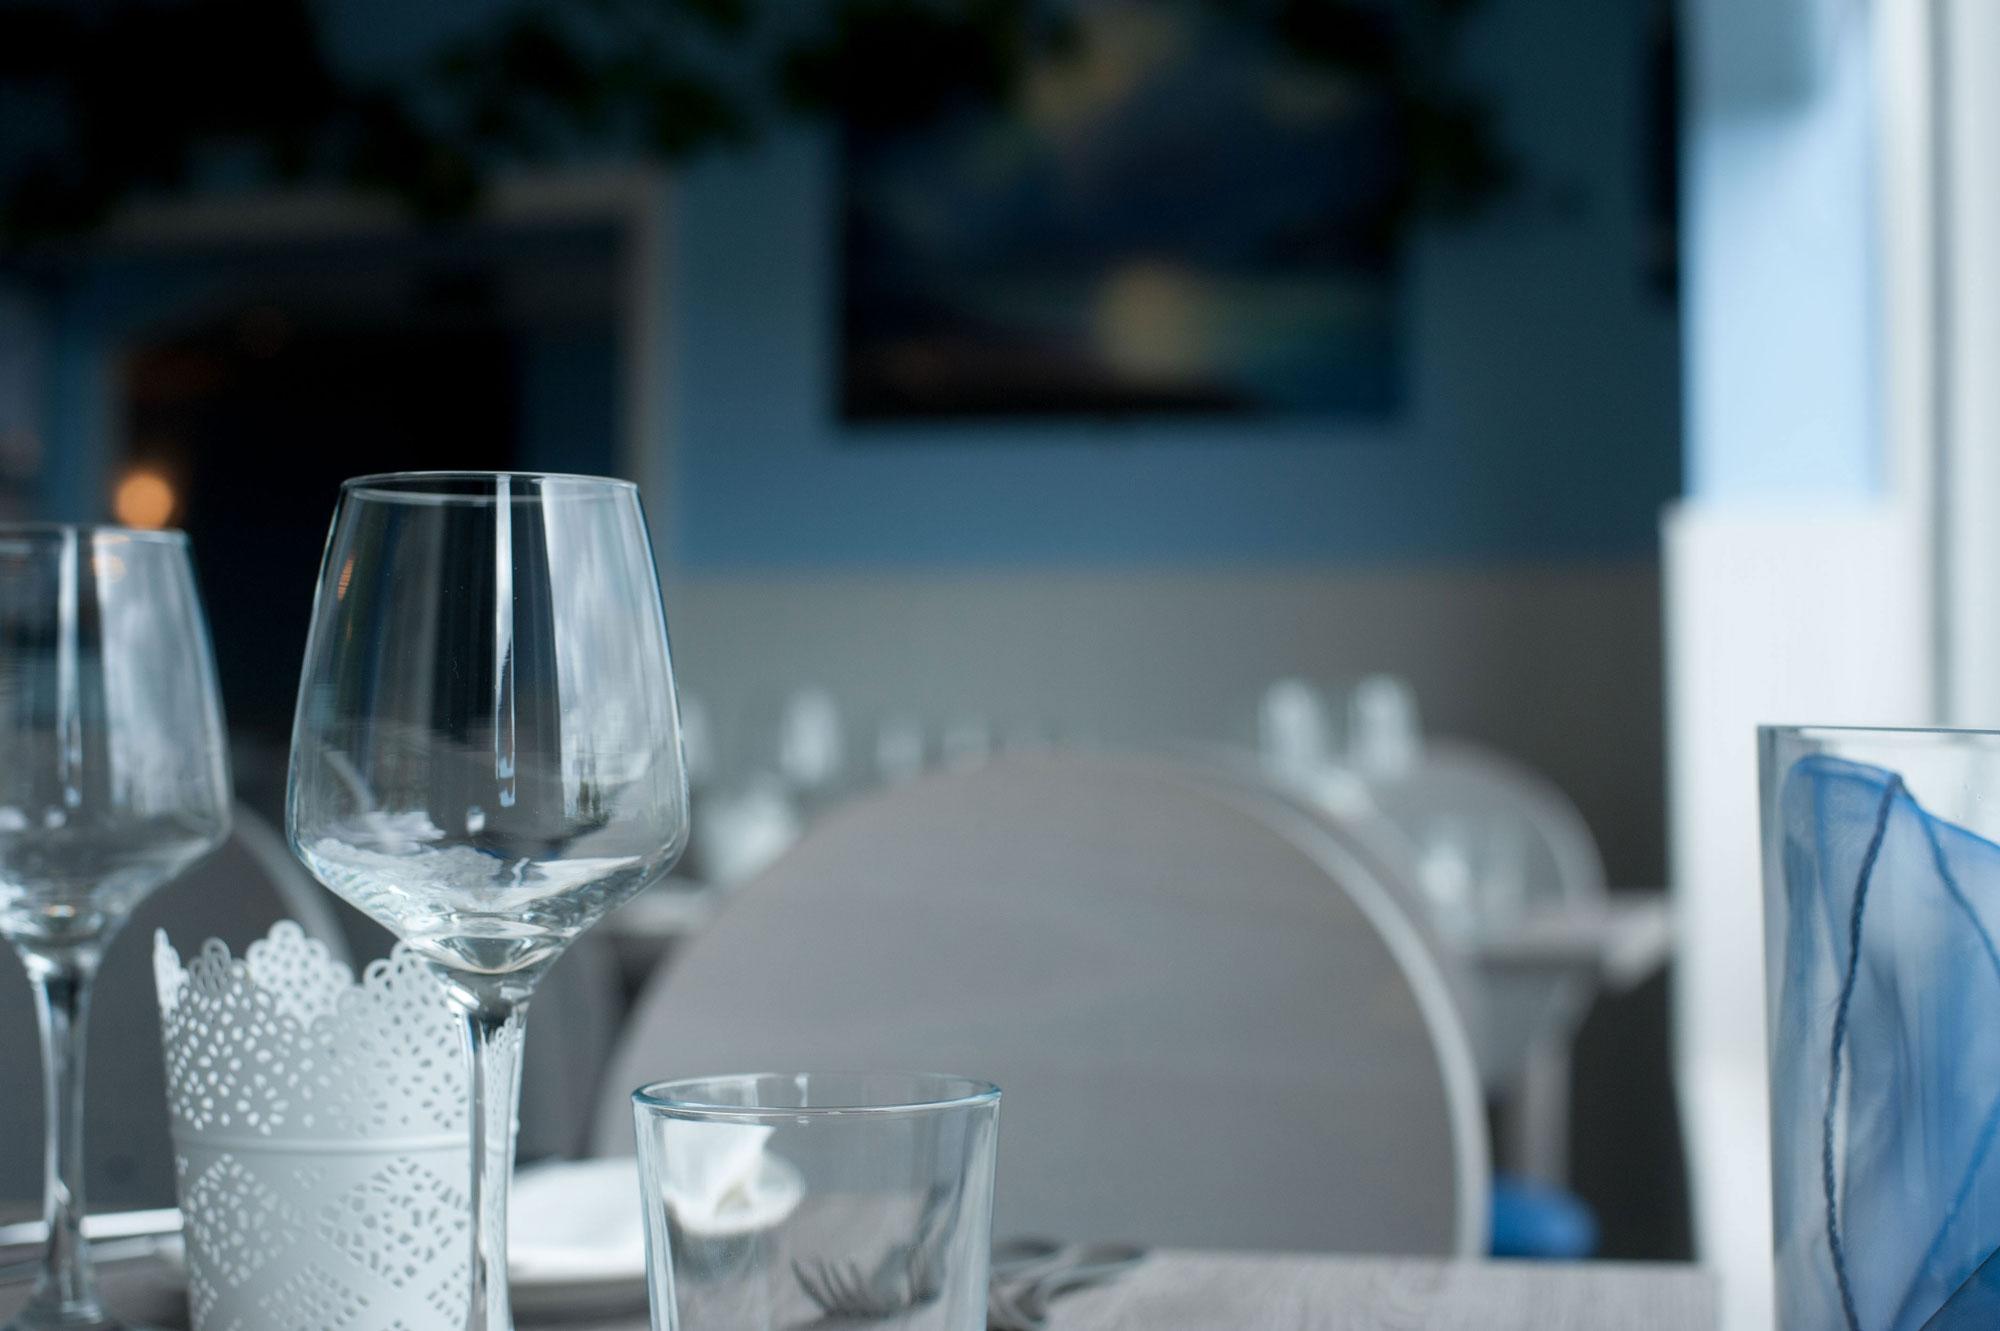 la cote table glasses wexford seafood